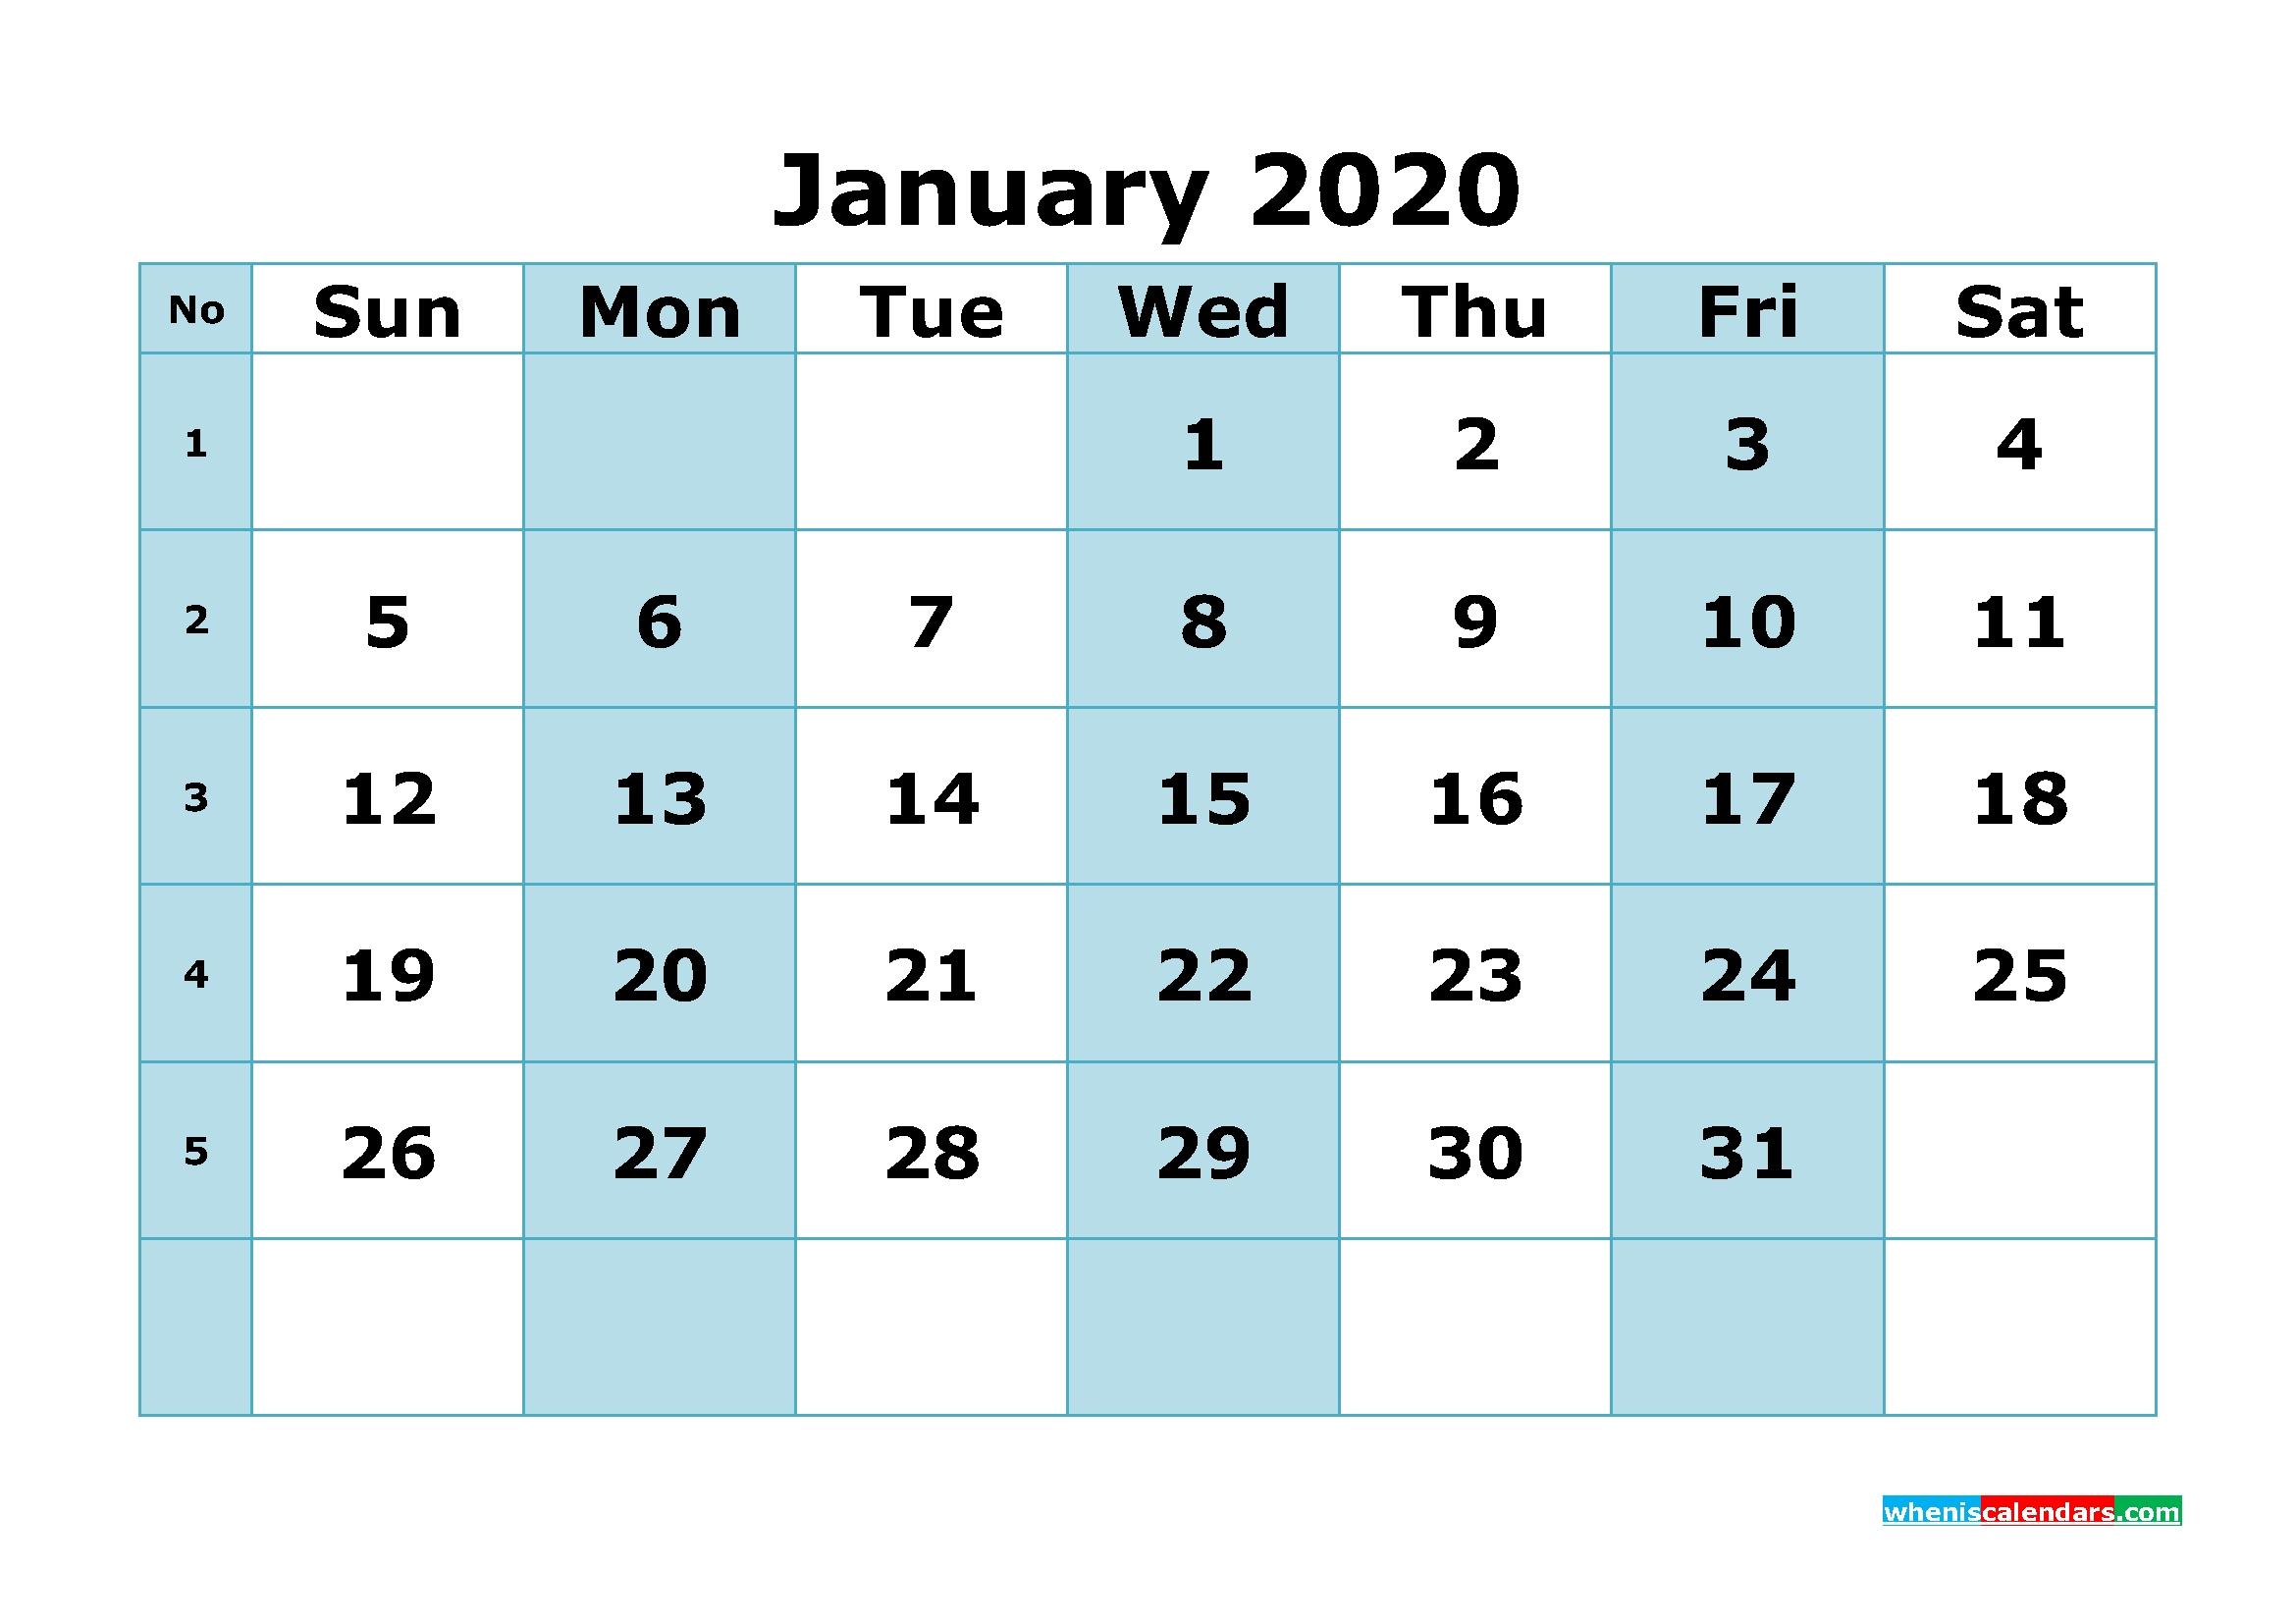 Free Printable January 2020 Calendar With Week Numbers